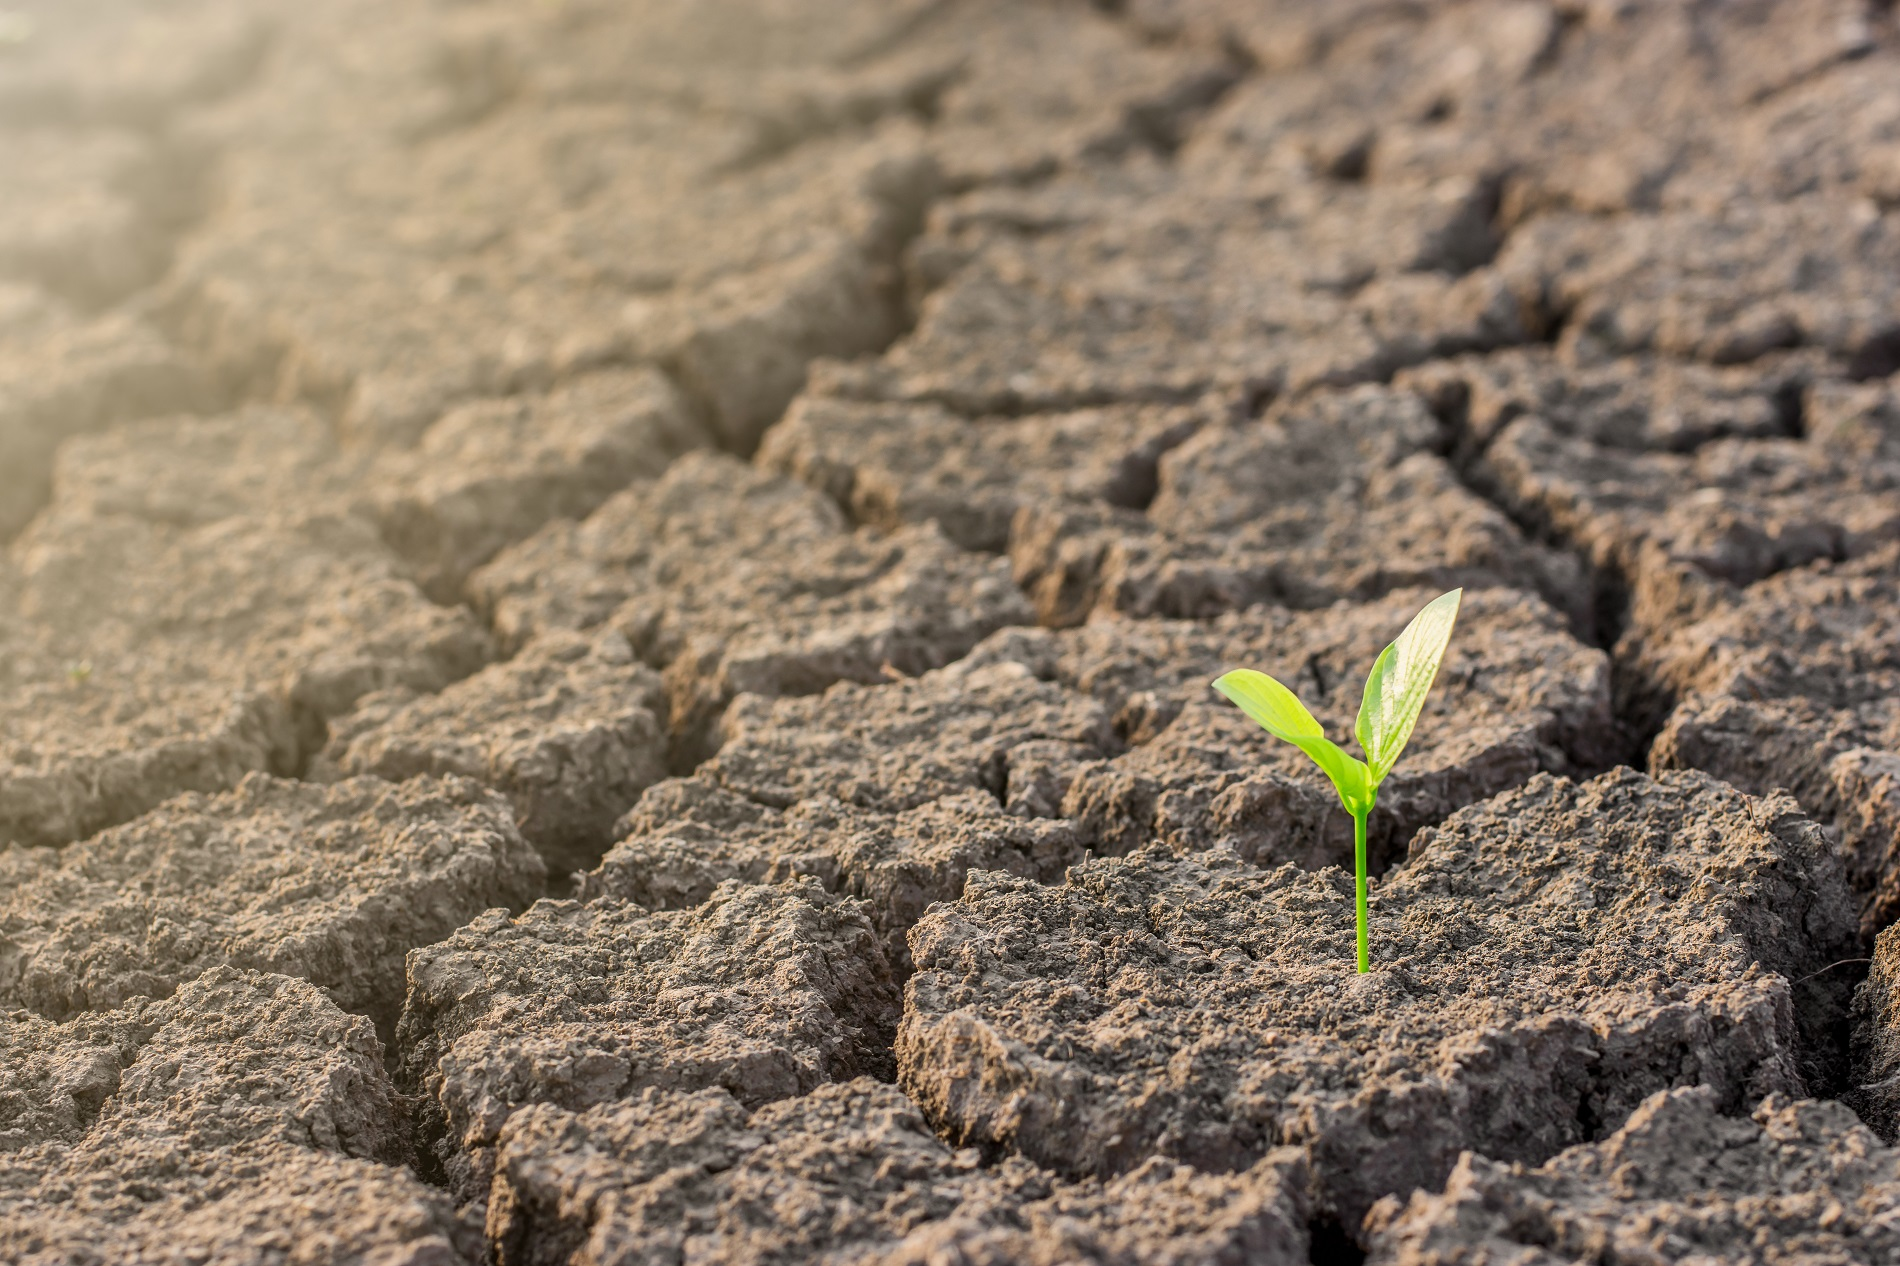 La agricultura frente al reto del cambio climático